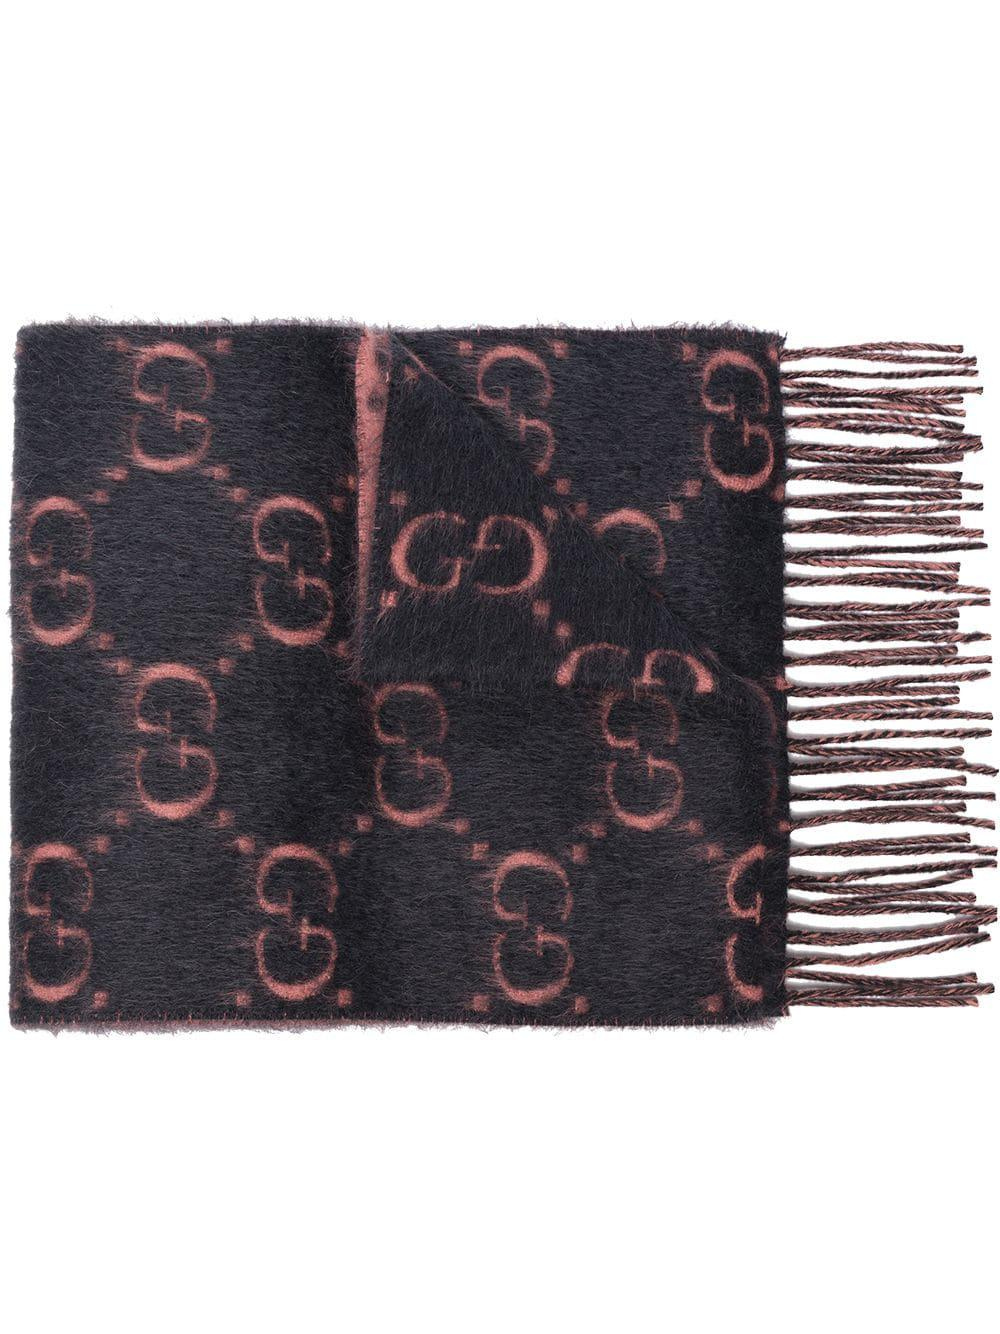 935fa4261d4 Lyst - Gucci Logo Intarsia Scarf